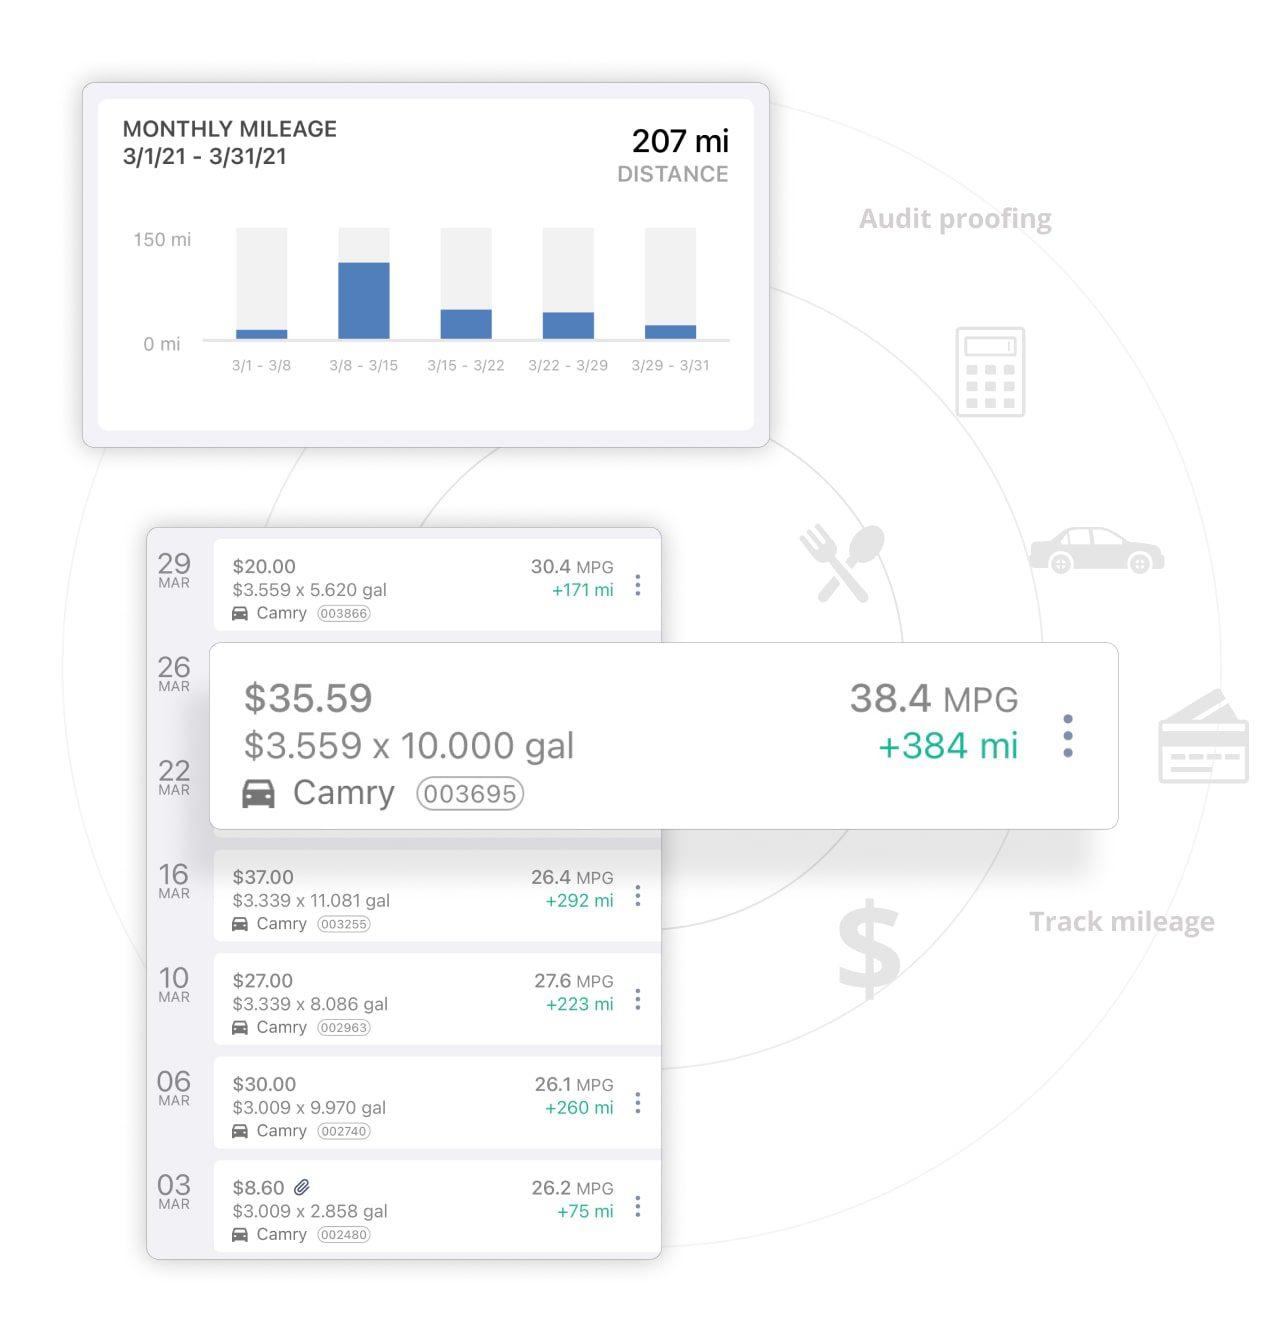 triplog track employee mileage reimbursements